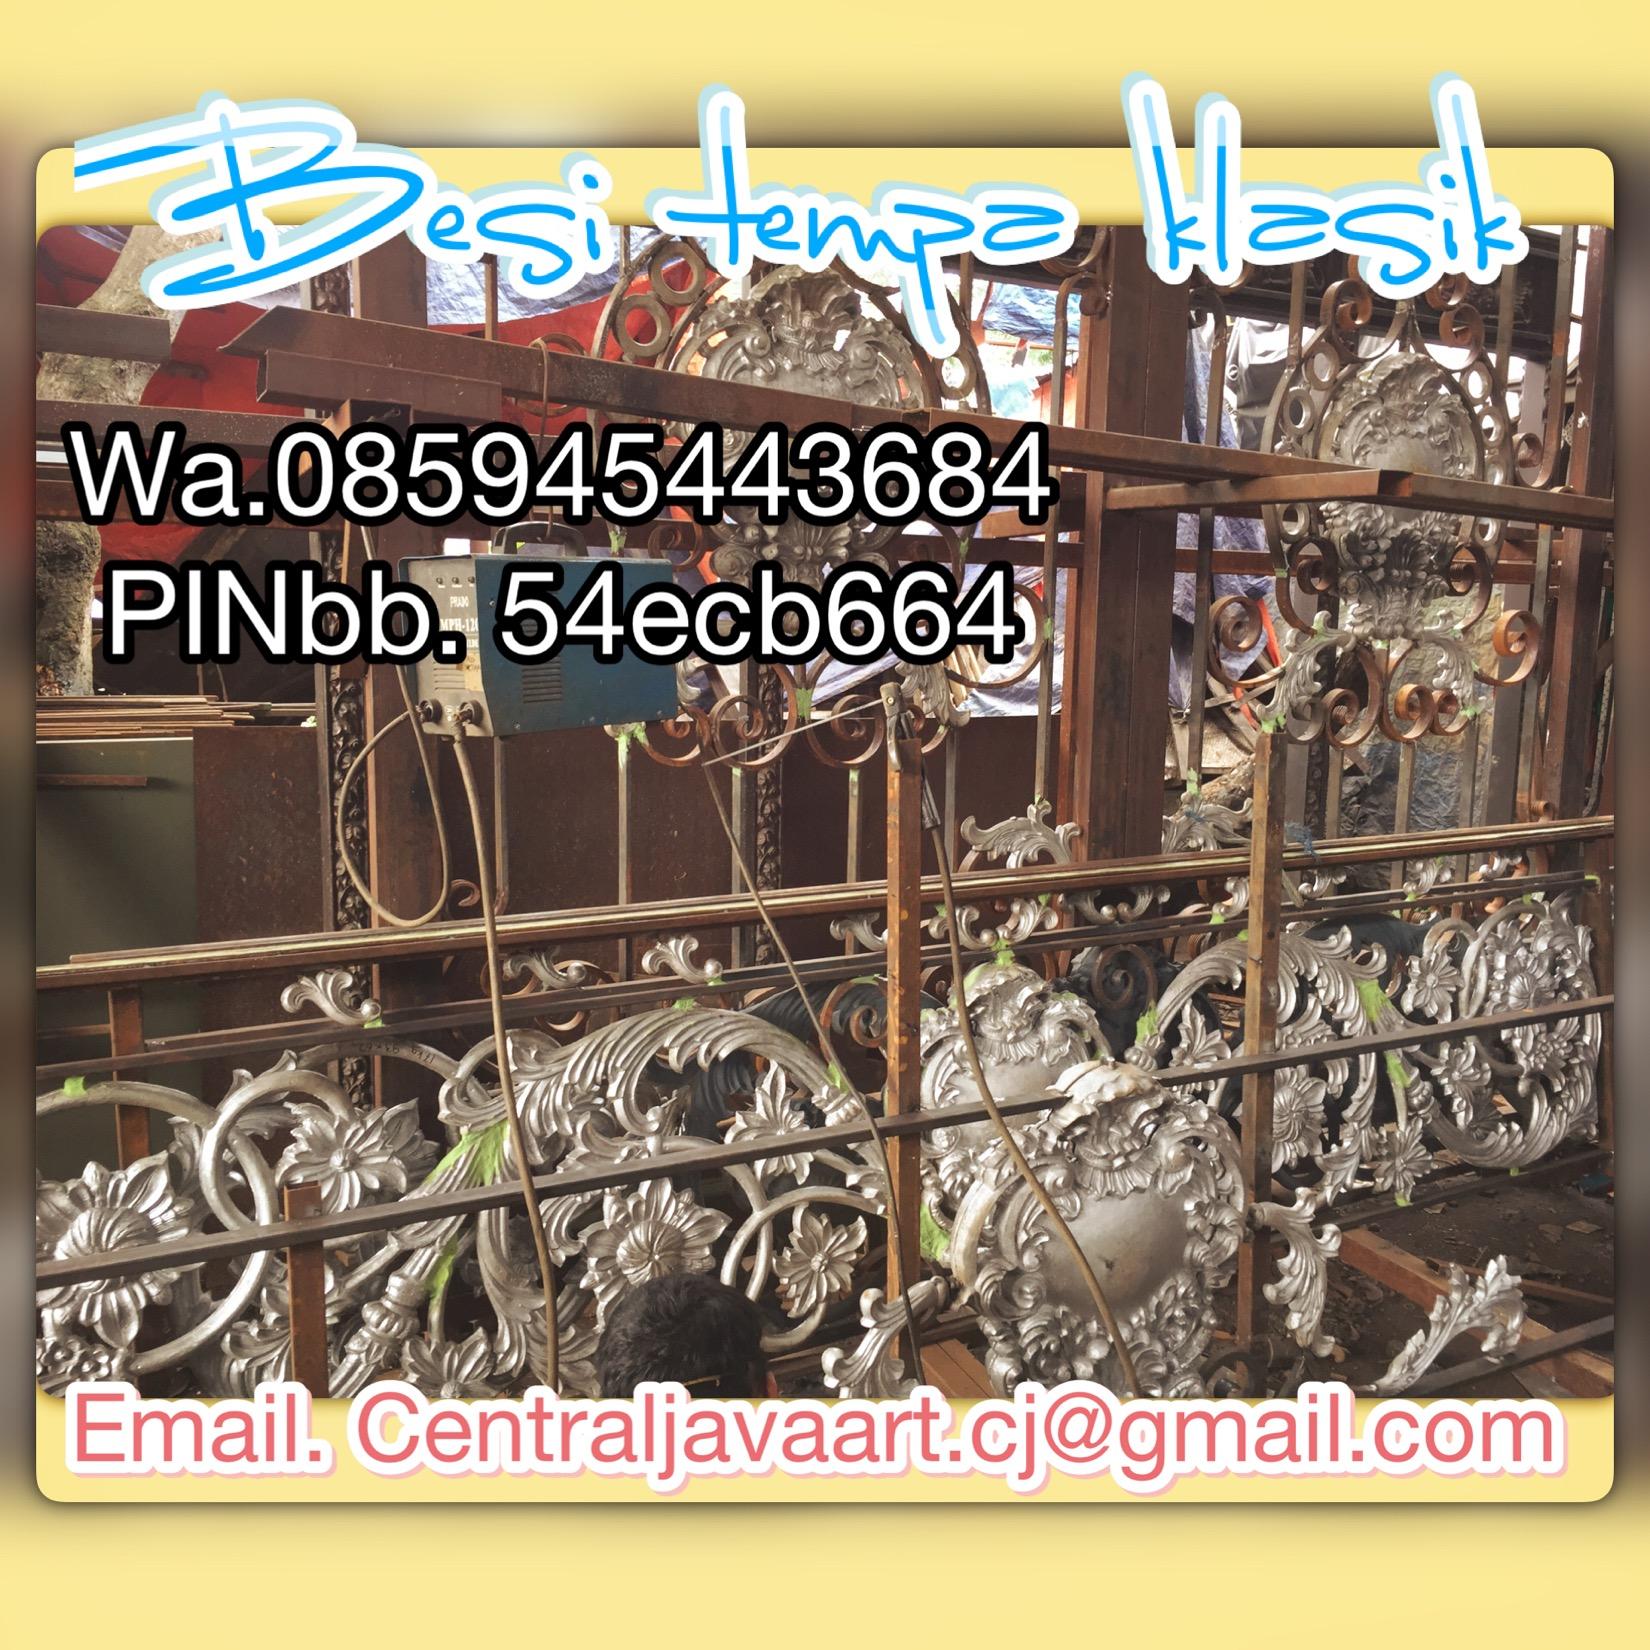 central java art. wa.085945443684 pinbb. 54ecb664